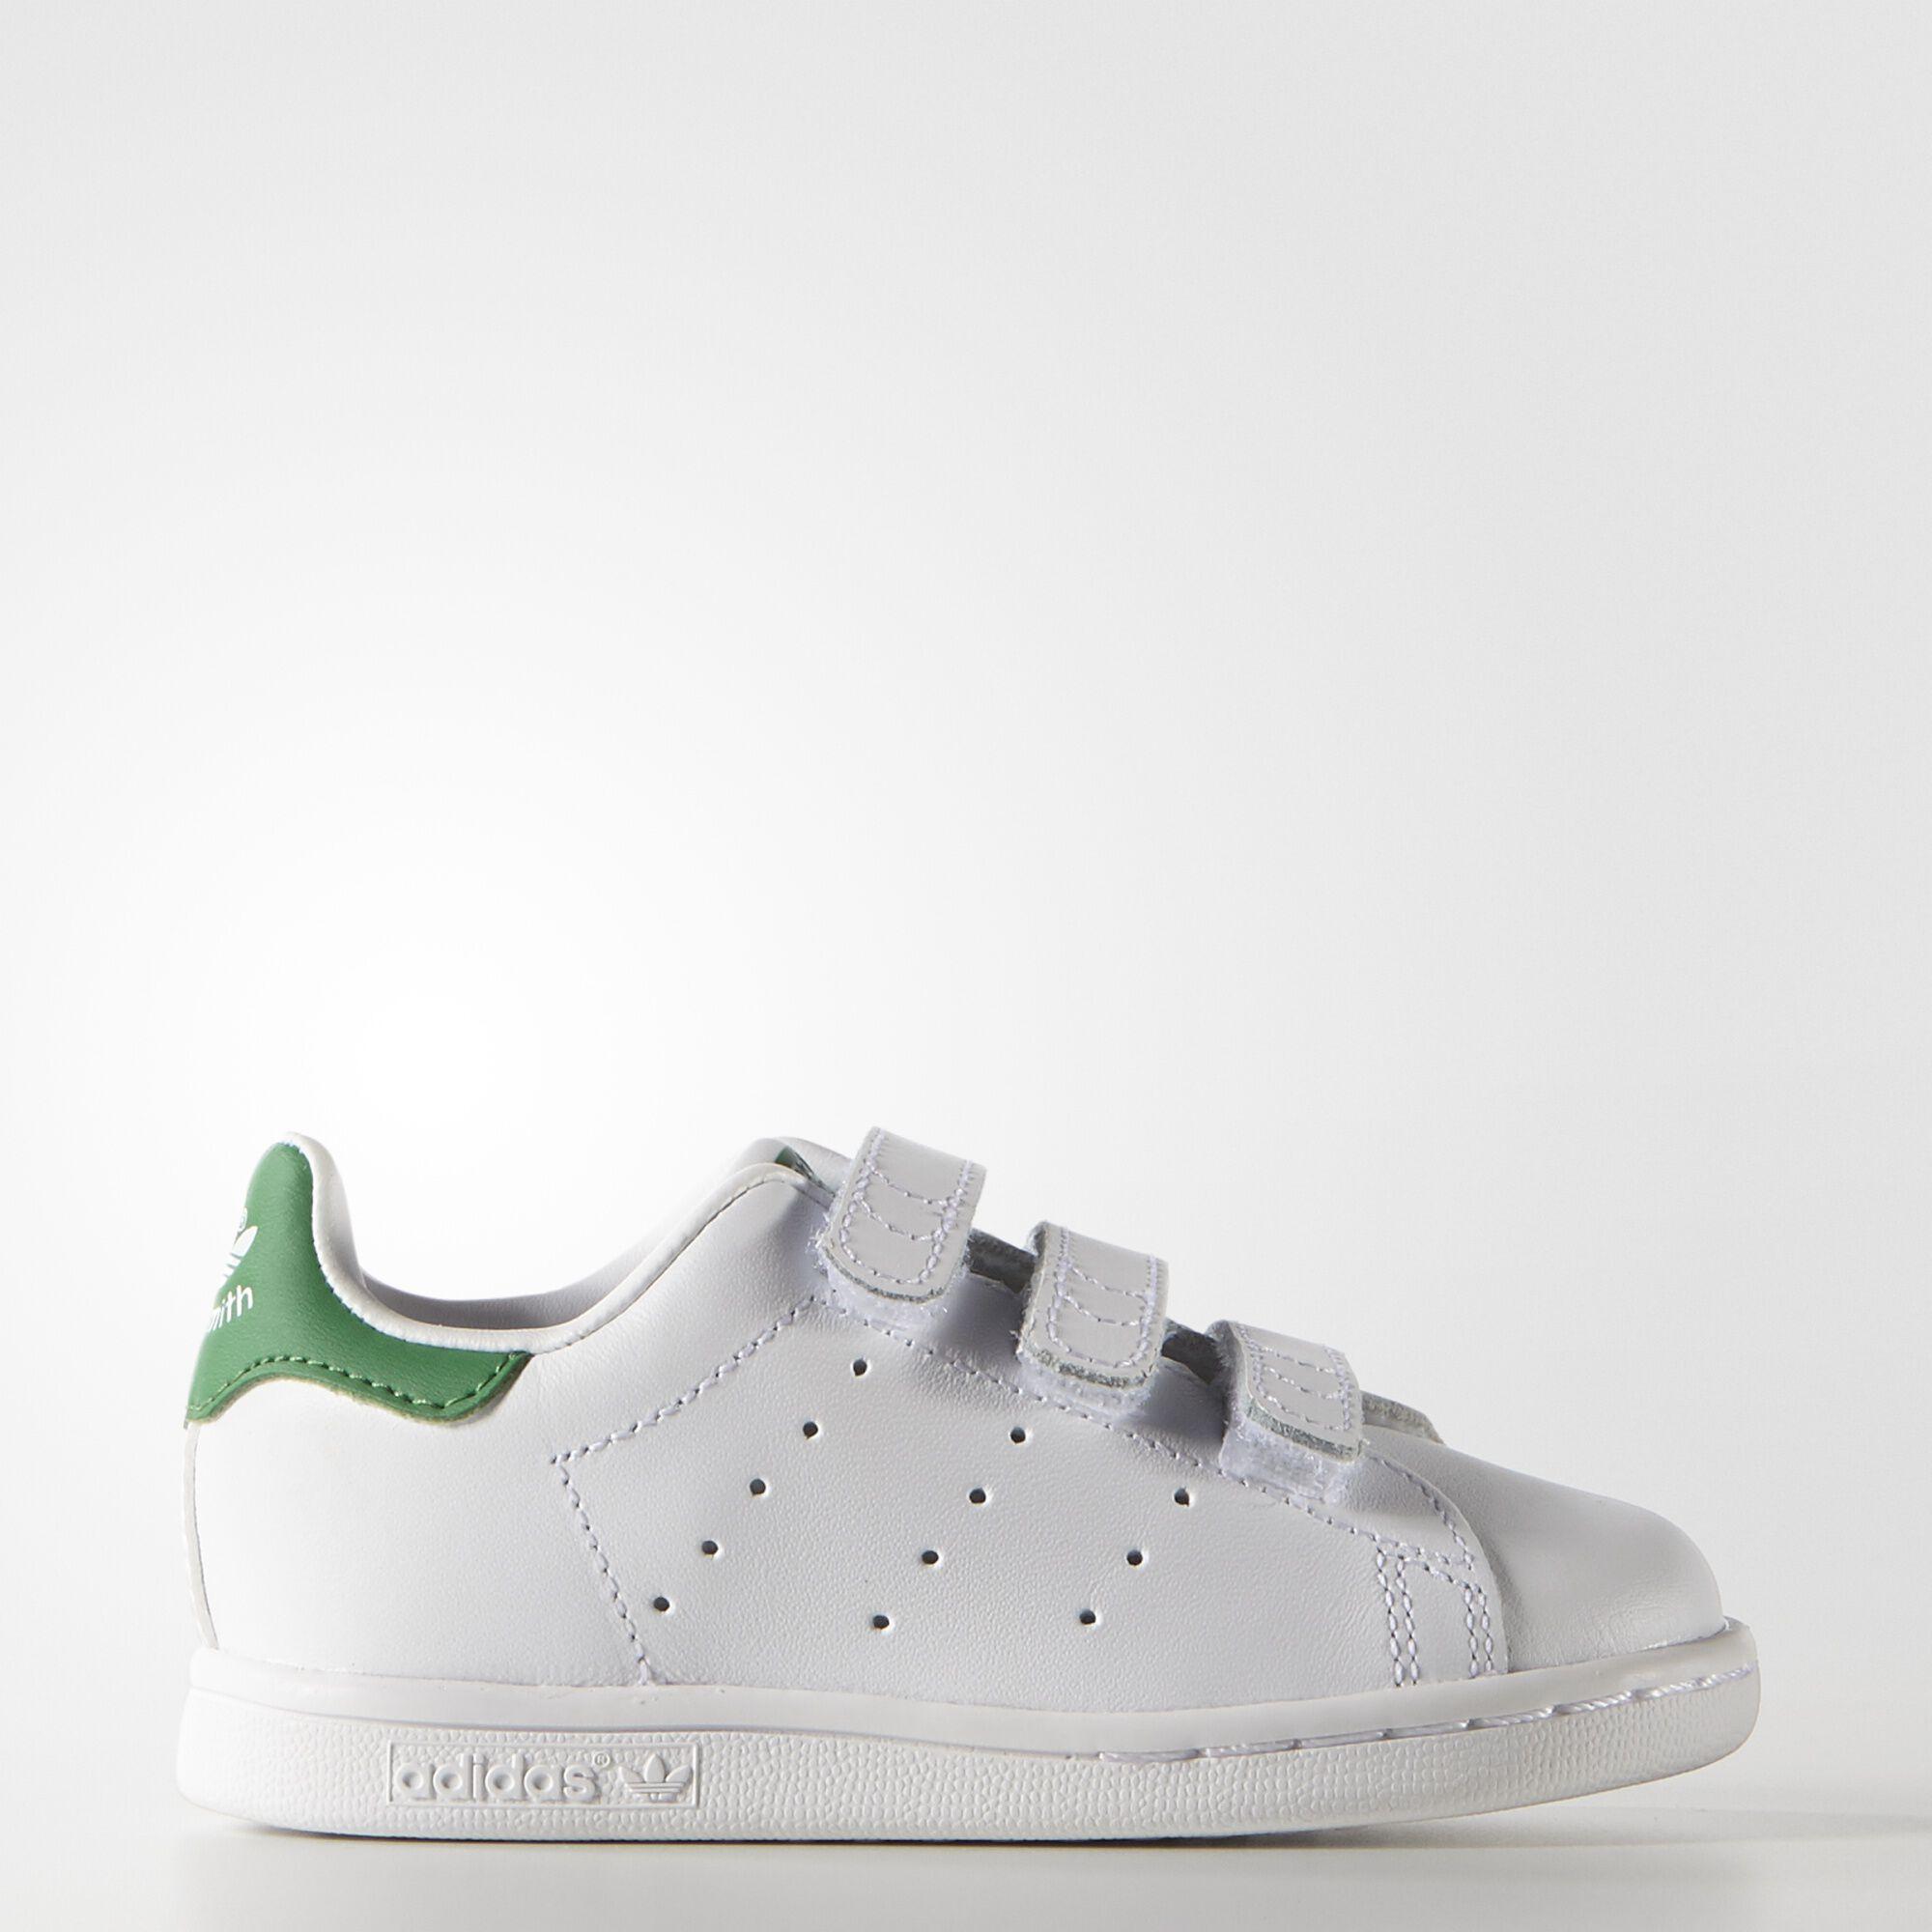 where to buy adidas superstar shoes in dubai adidas stan smith white green